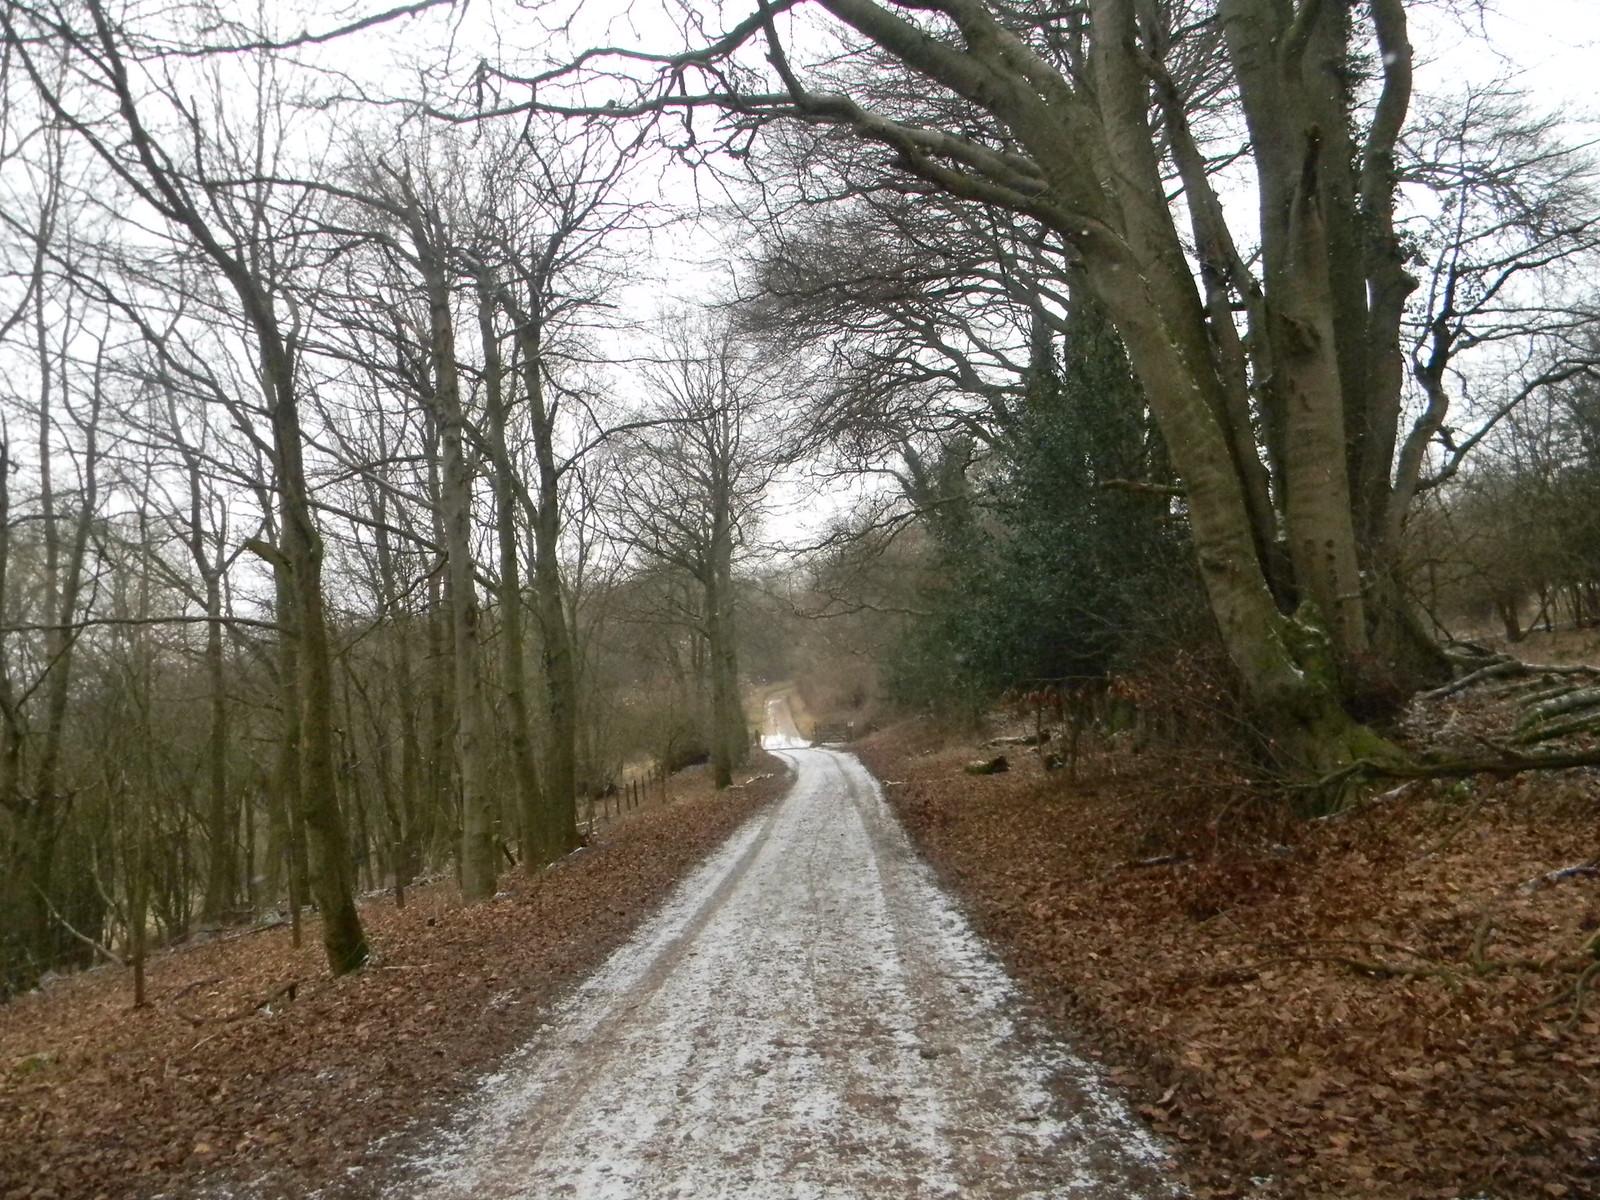 Snowy path 2 Tring to Berkhamsted (via shortcut)